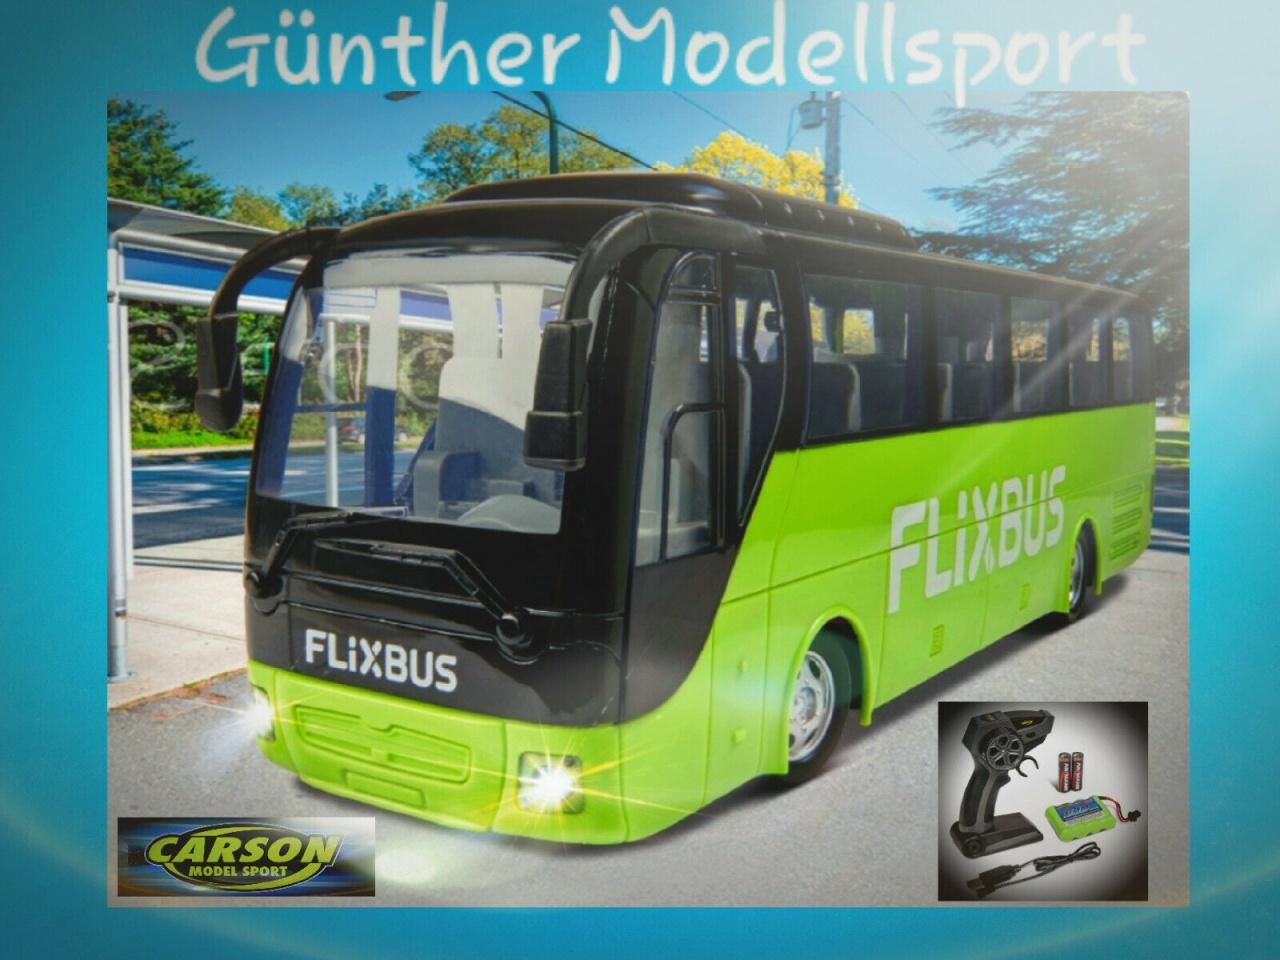 Carson FlixBus 2.4GHz 100% RTR, 500907342